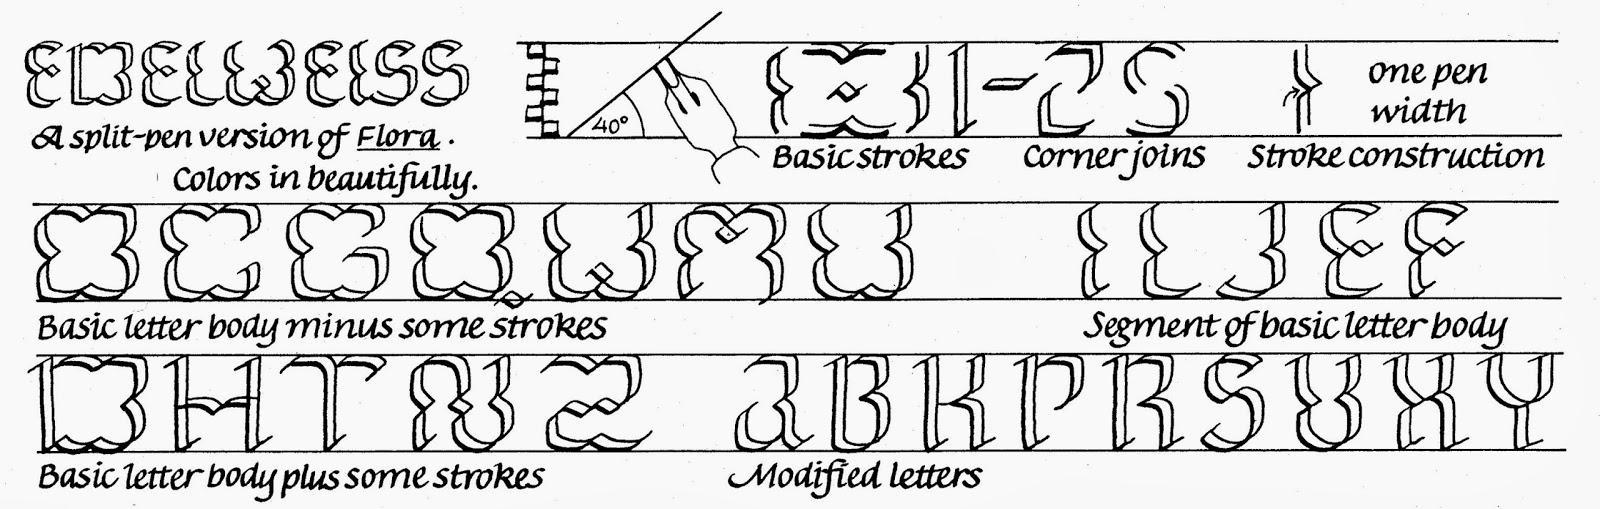 Margaret Shepherd: Calligraphy Blog: 290 Edelweiss